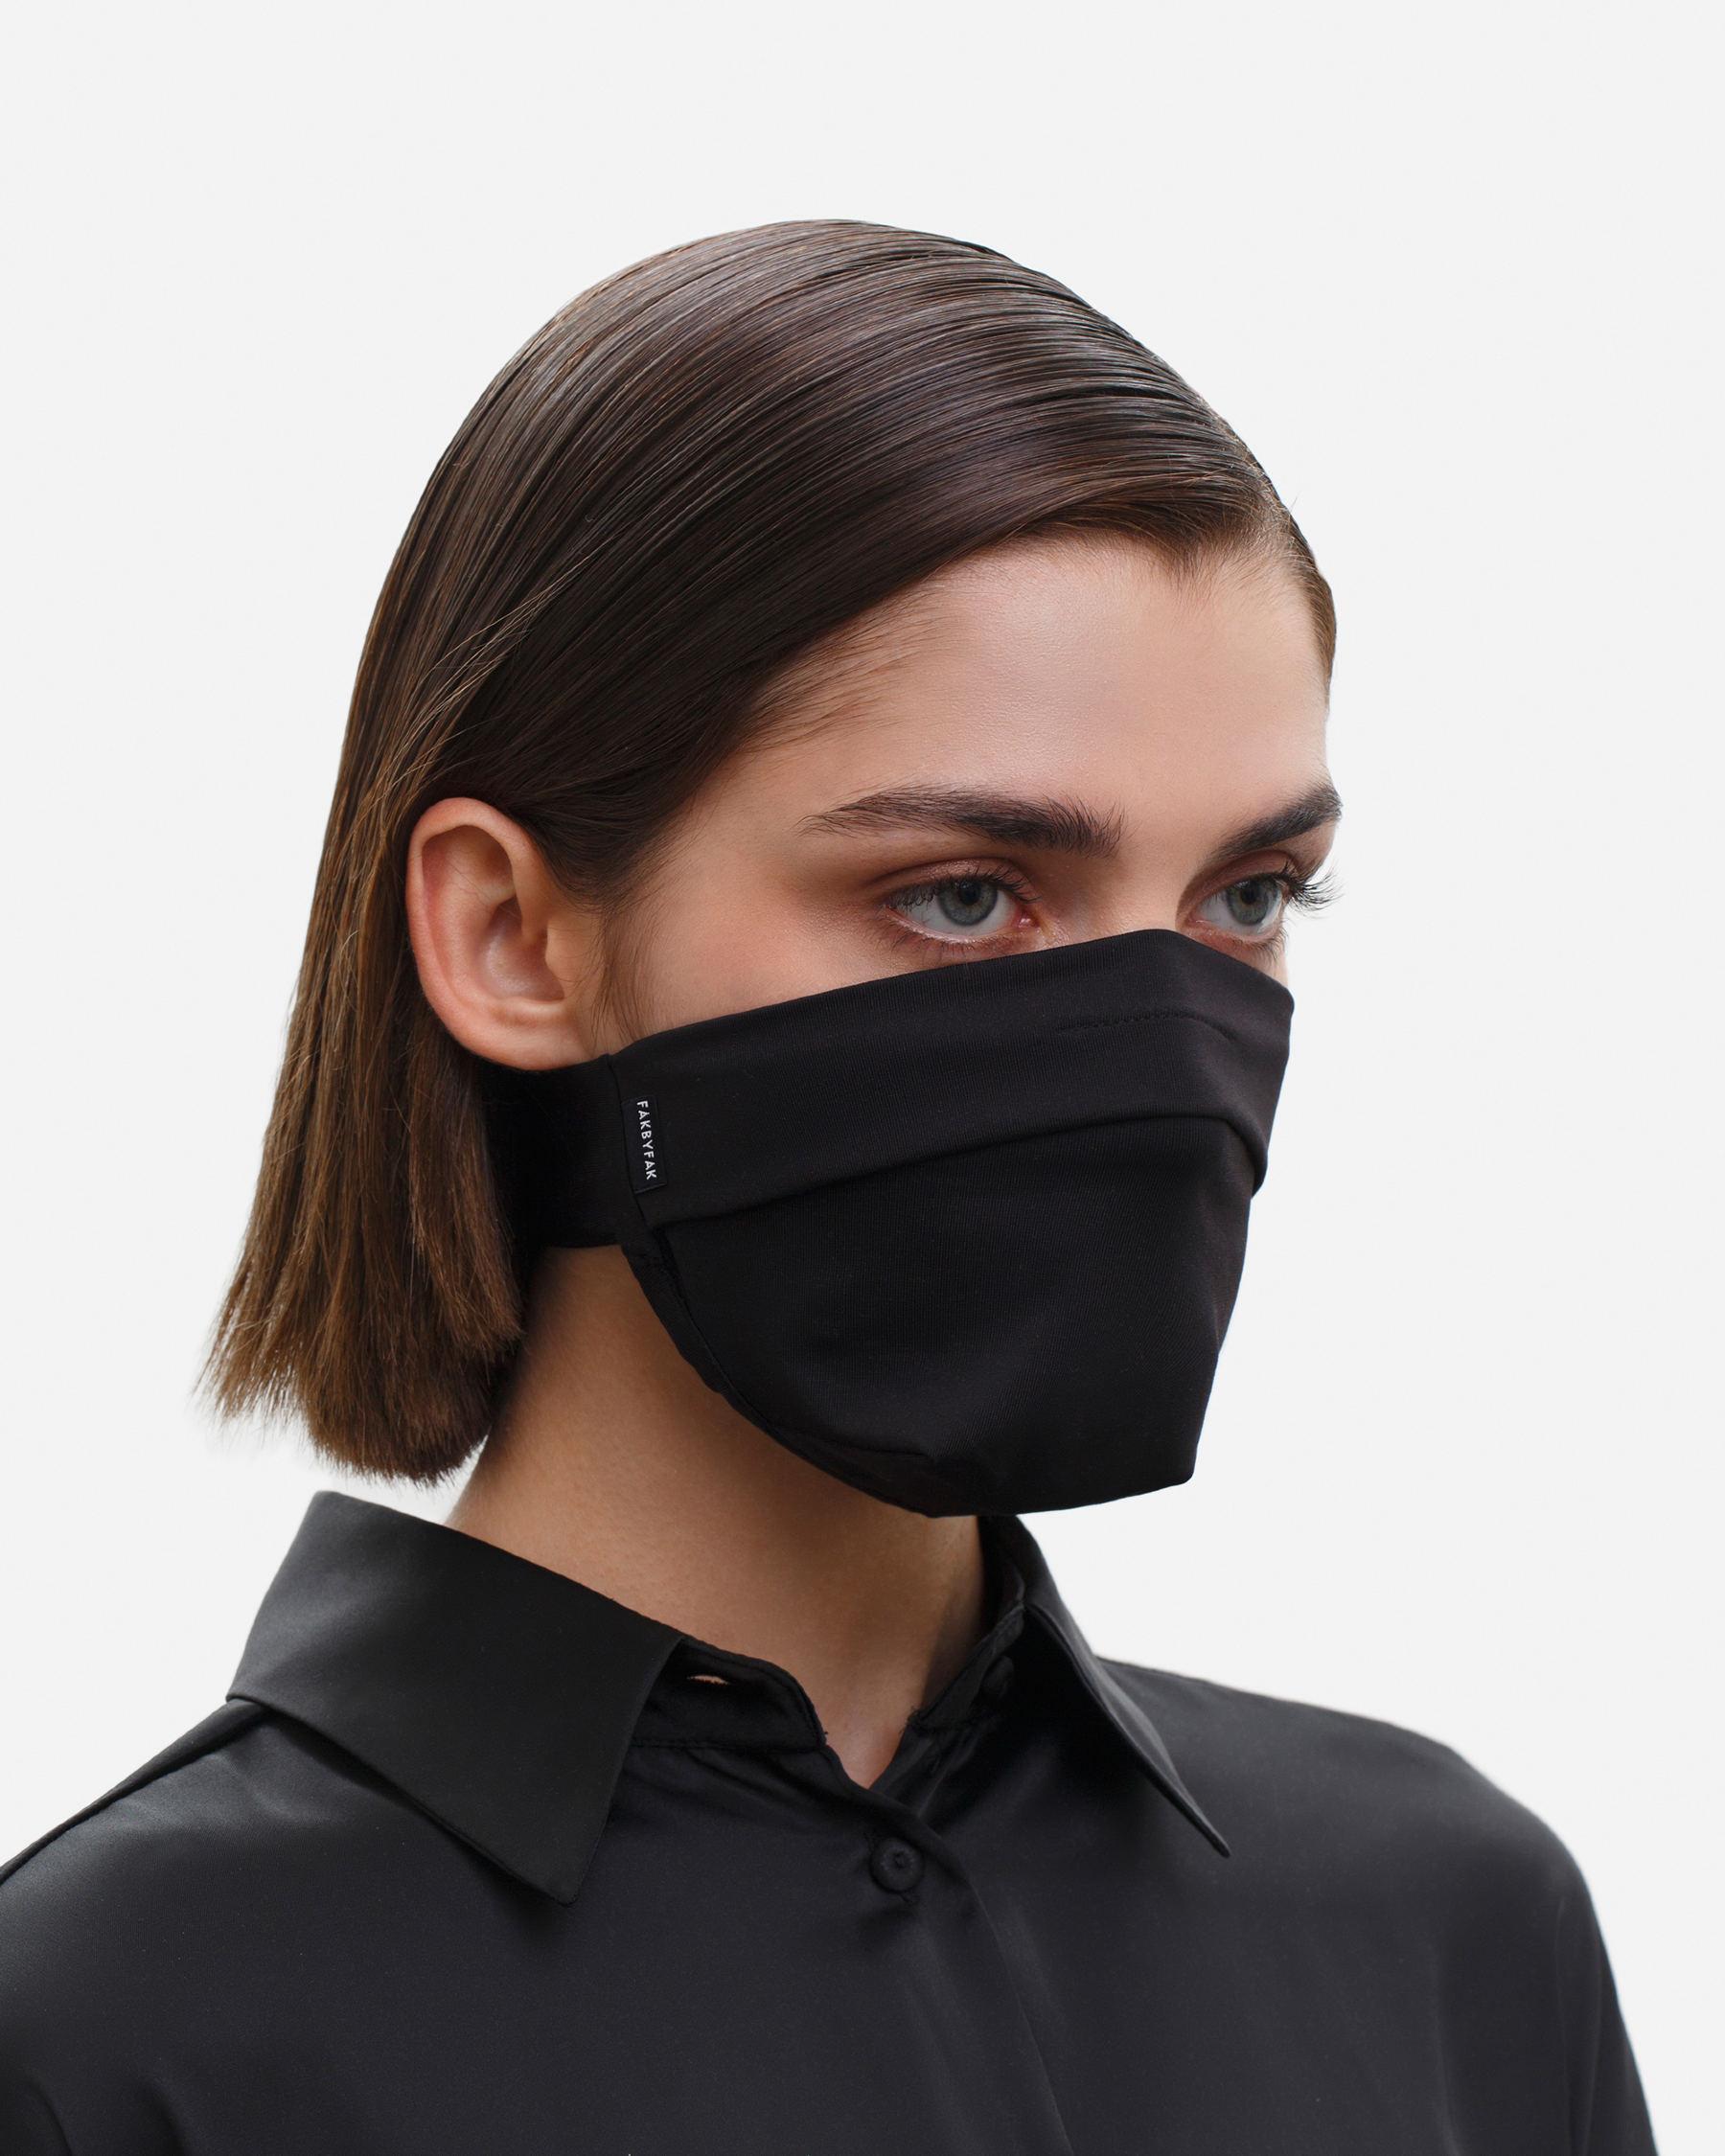 FAKBYFAK  The Vega. Ear Strap-Free High-End Protective Antibacterial (ATB-UV+) Face Mask. Black Code: FBF-42101-01